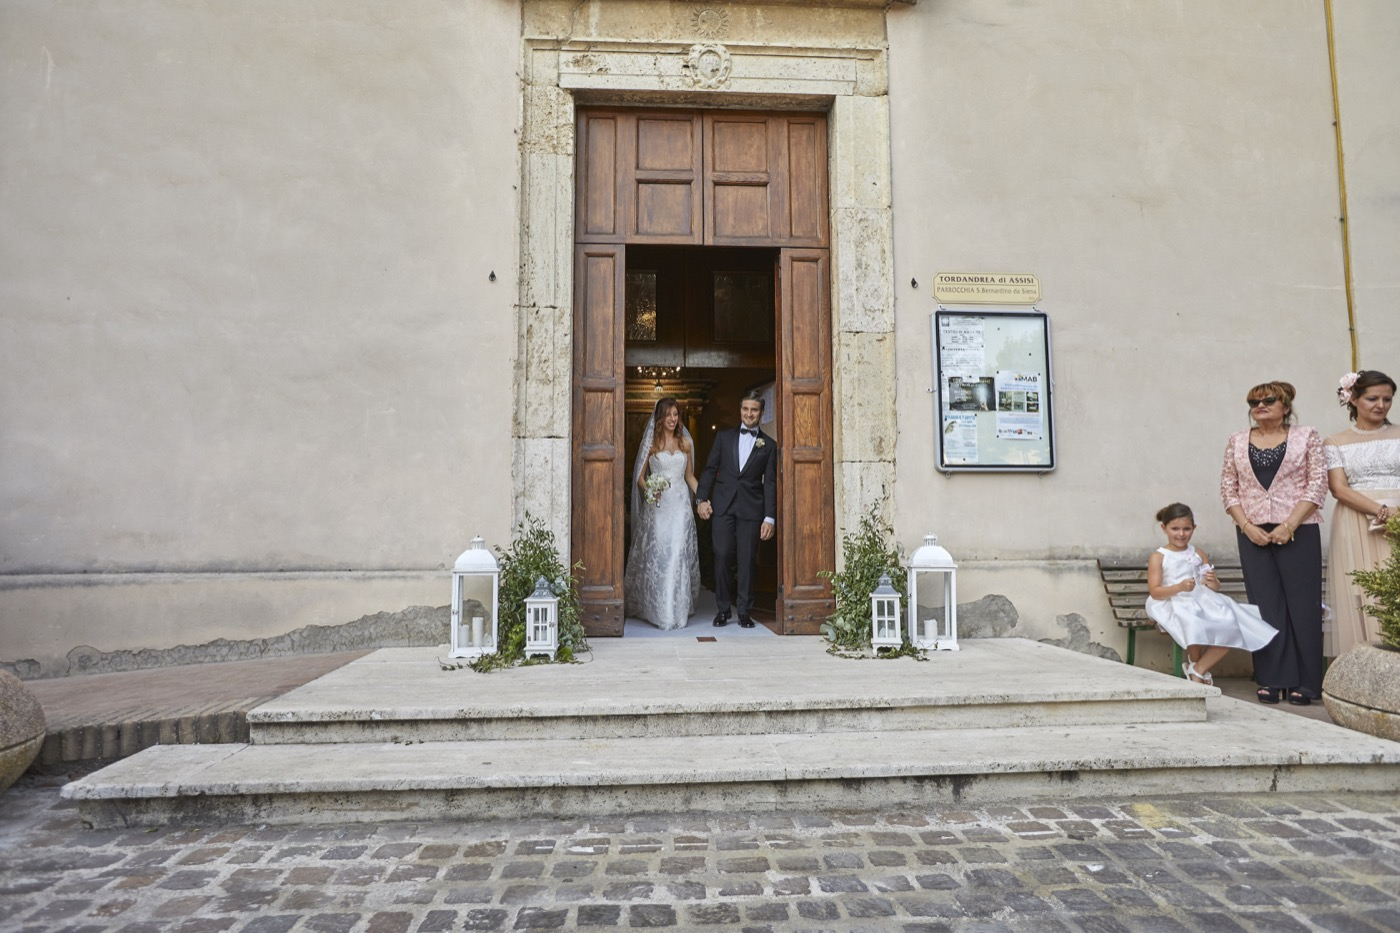 Claudio-Coppola-wedding-photographer-abbazia-7-frati-piegaro-55